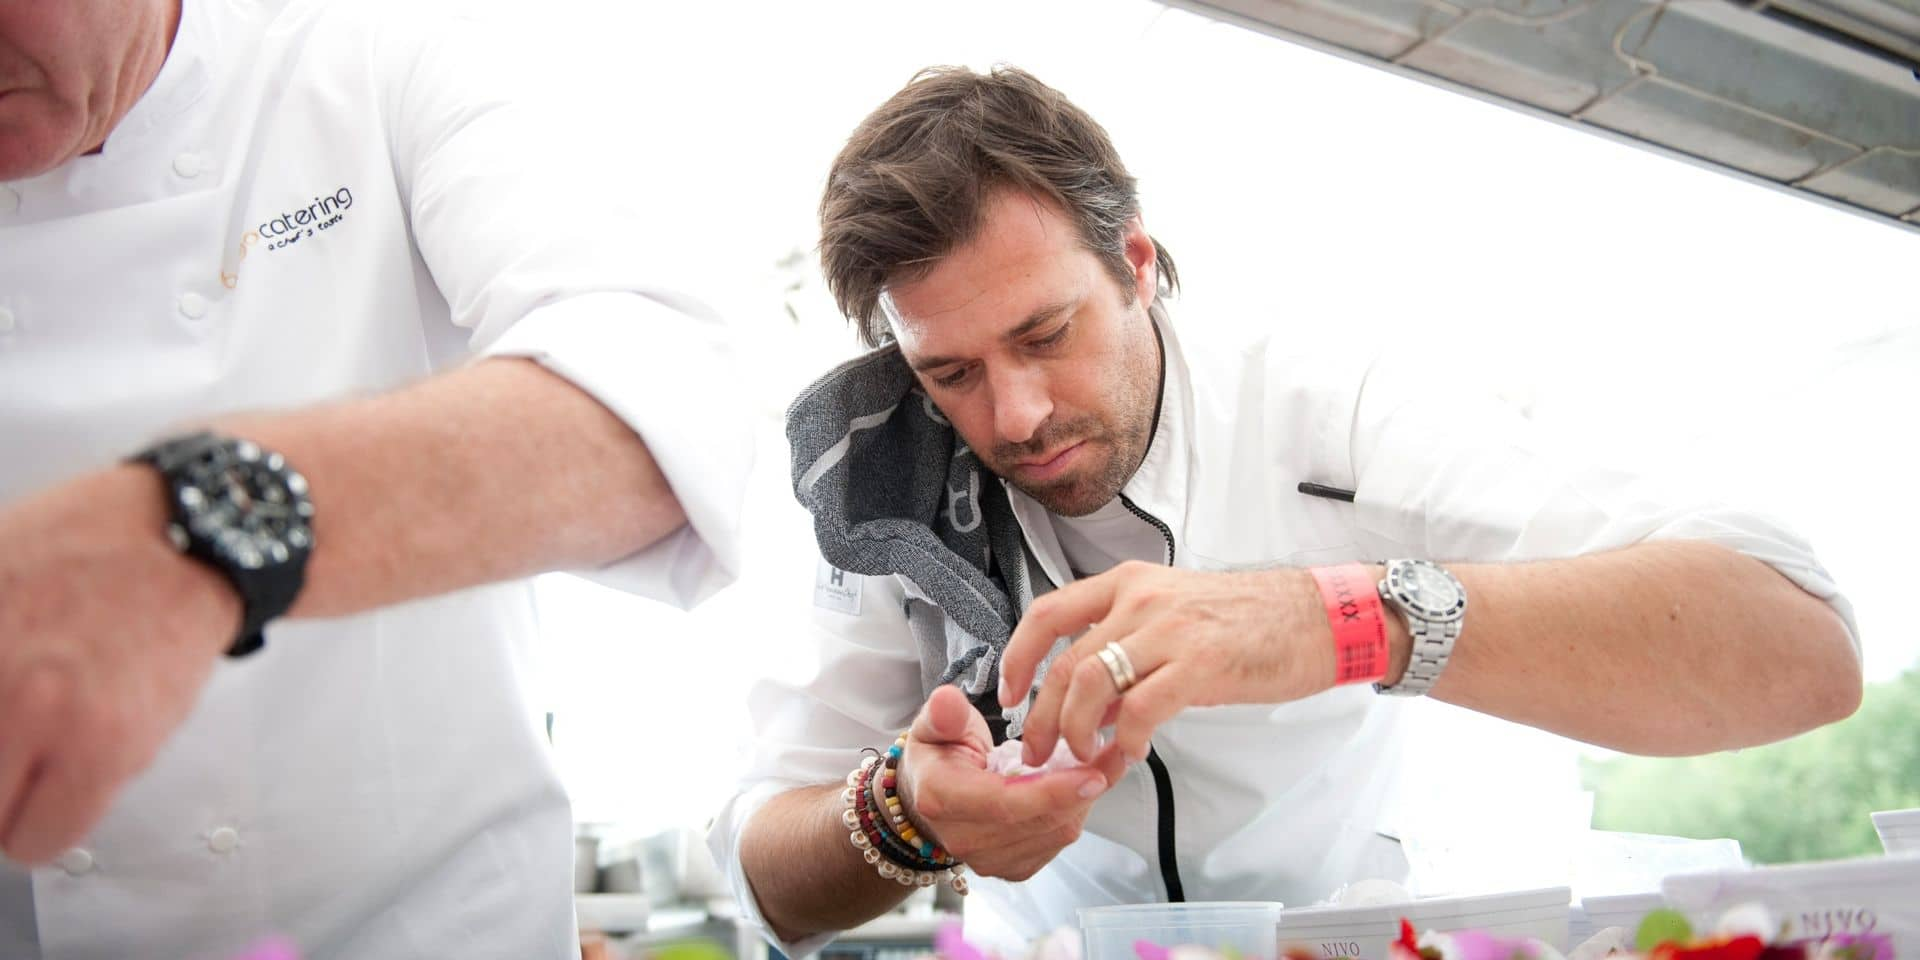 Sergio Herman quitte le restaurant The Jane à Anvers